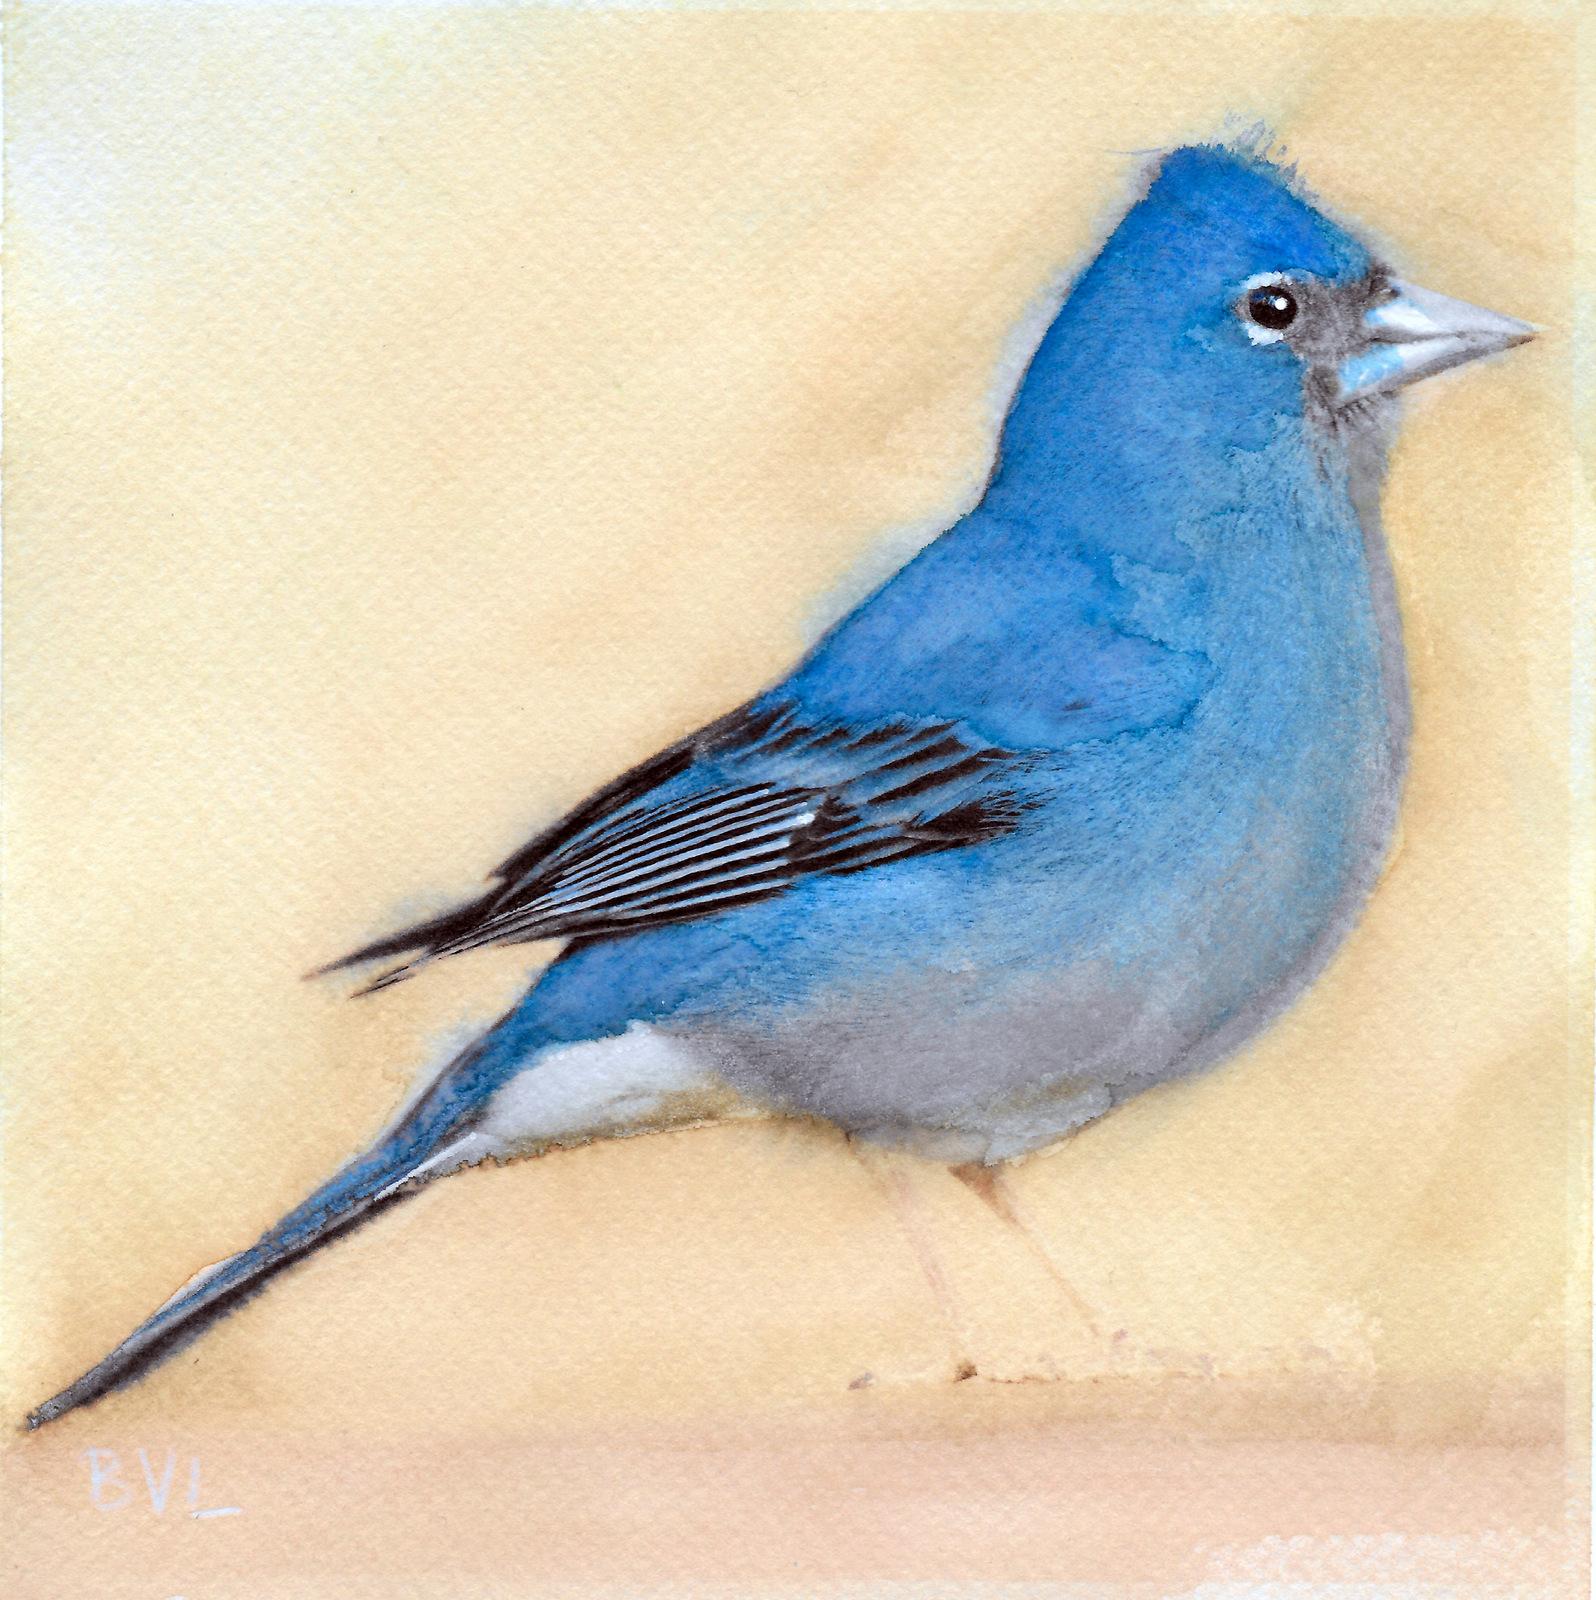 Tenerif Blue